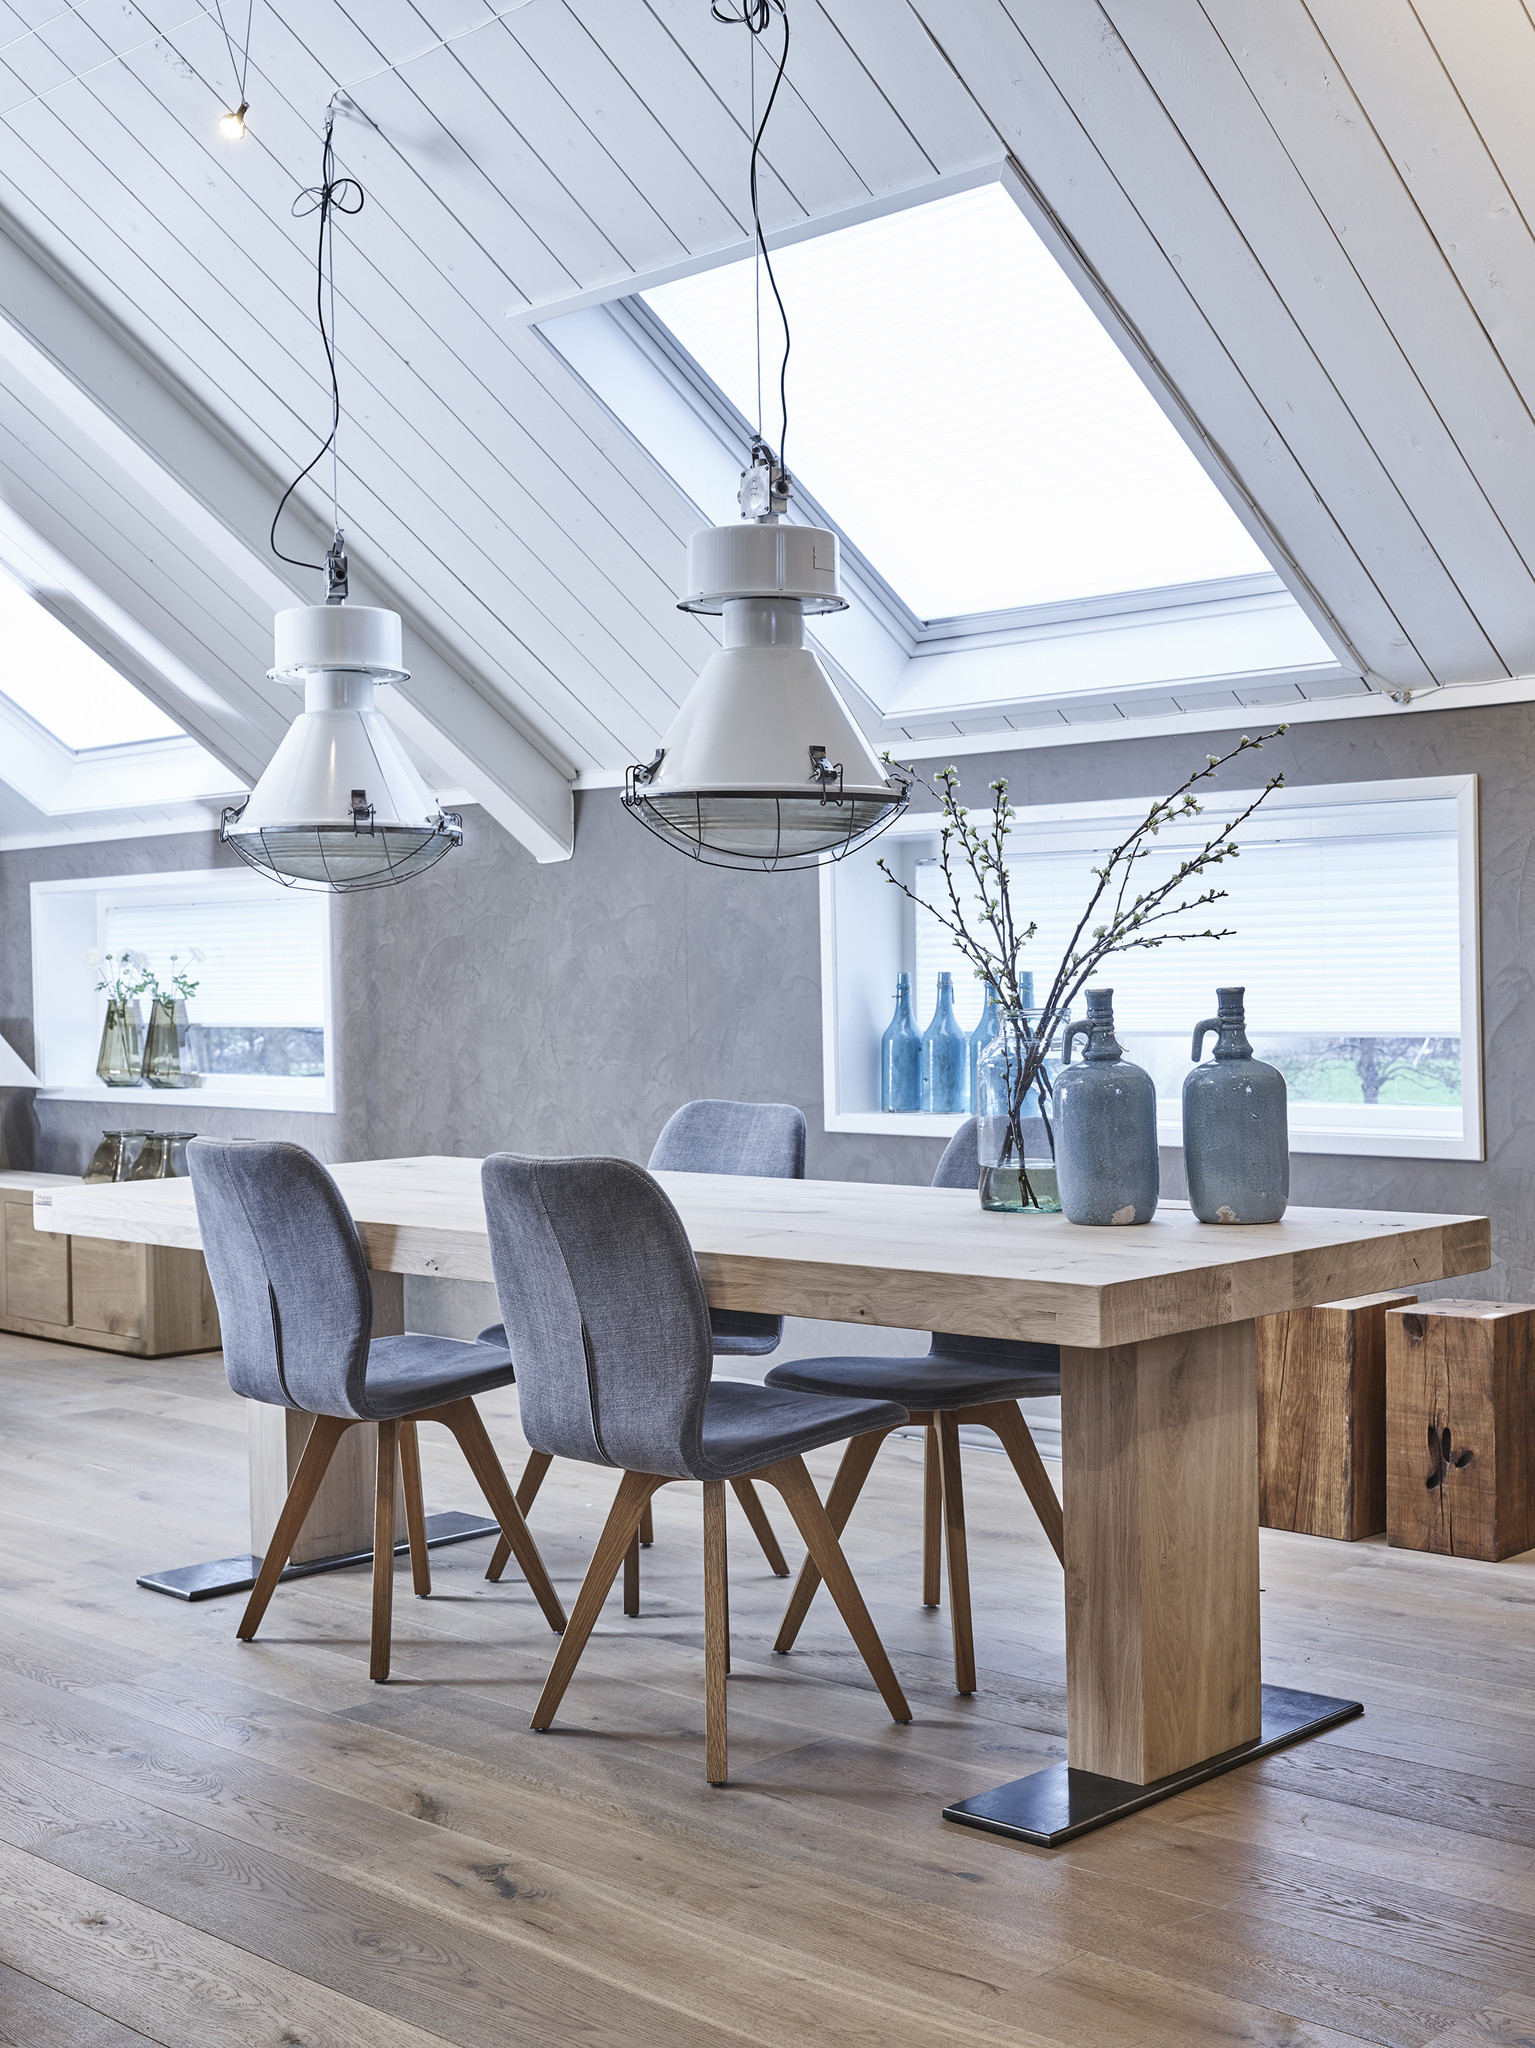 Tafel Eiken houten tafel 'Londen'